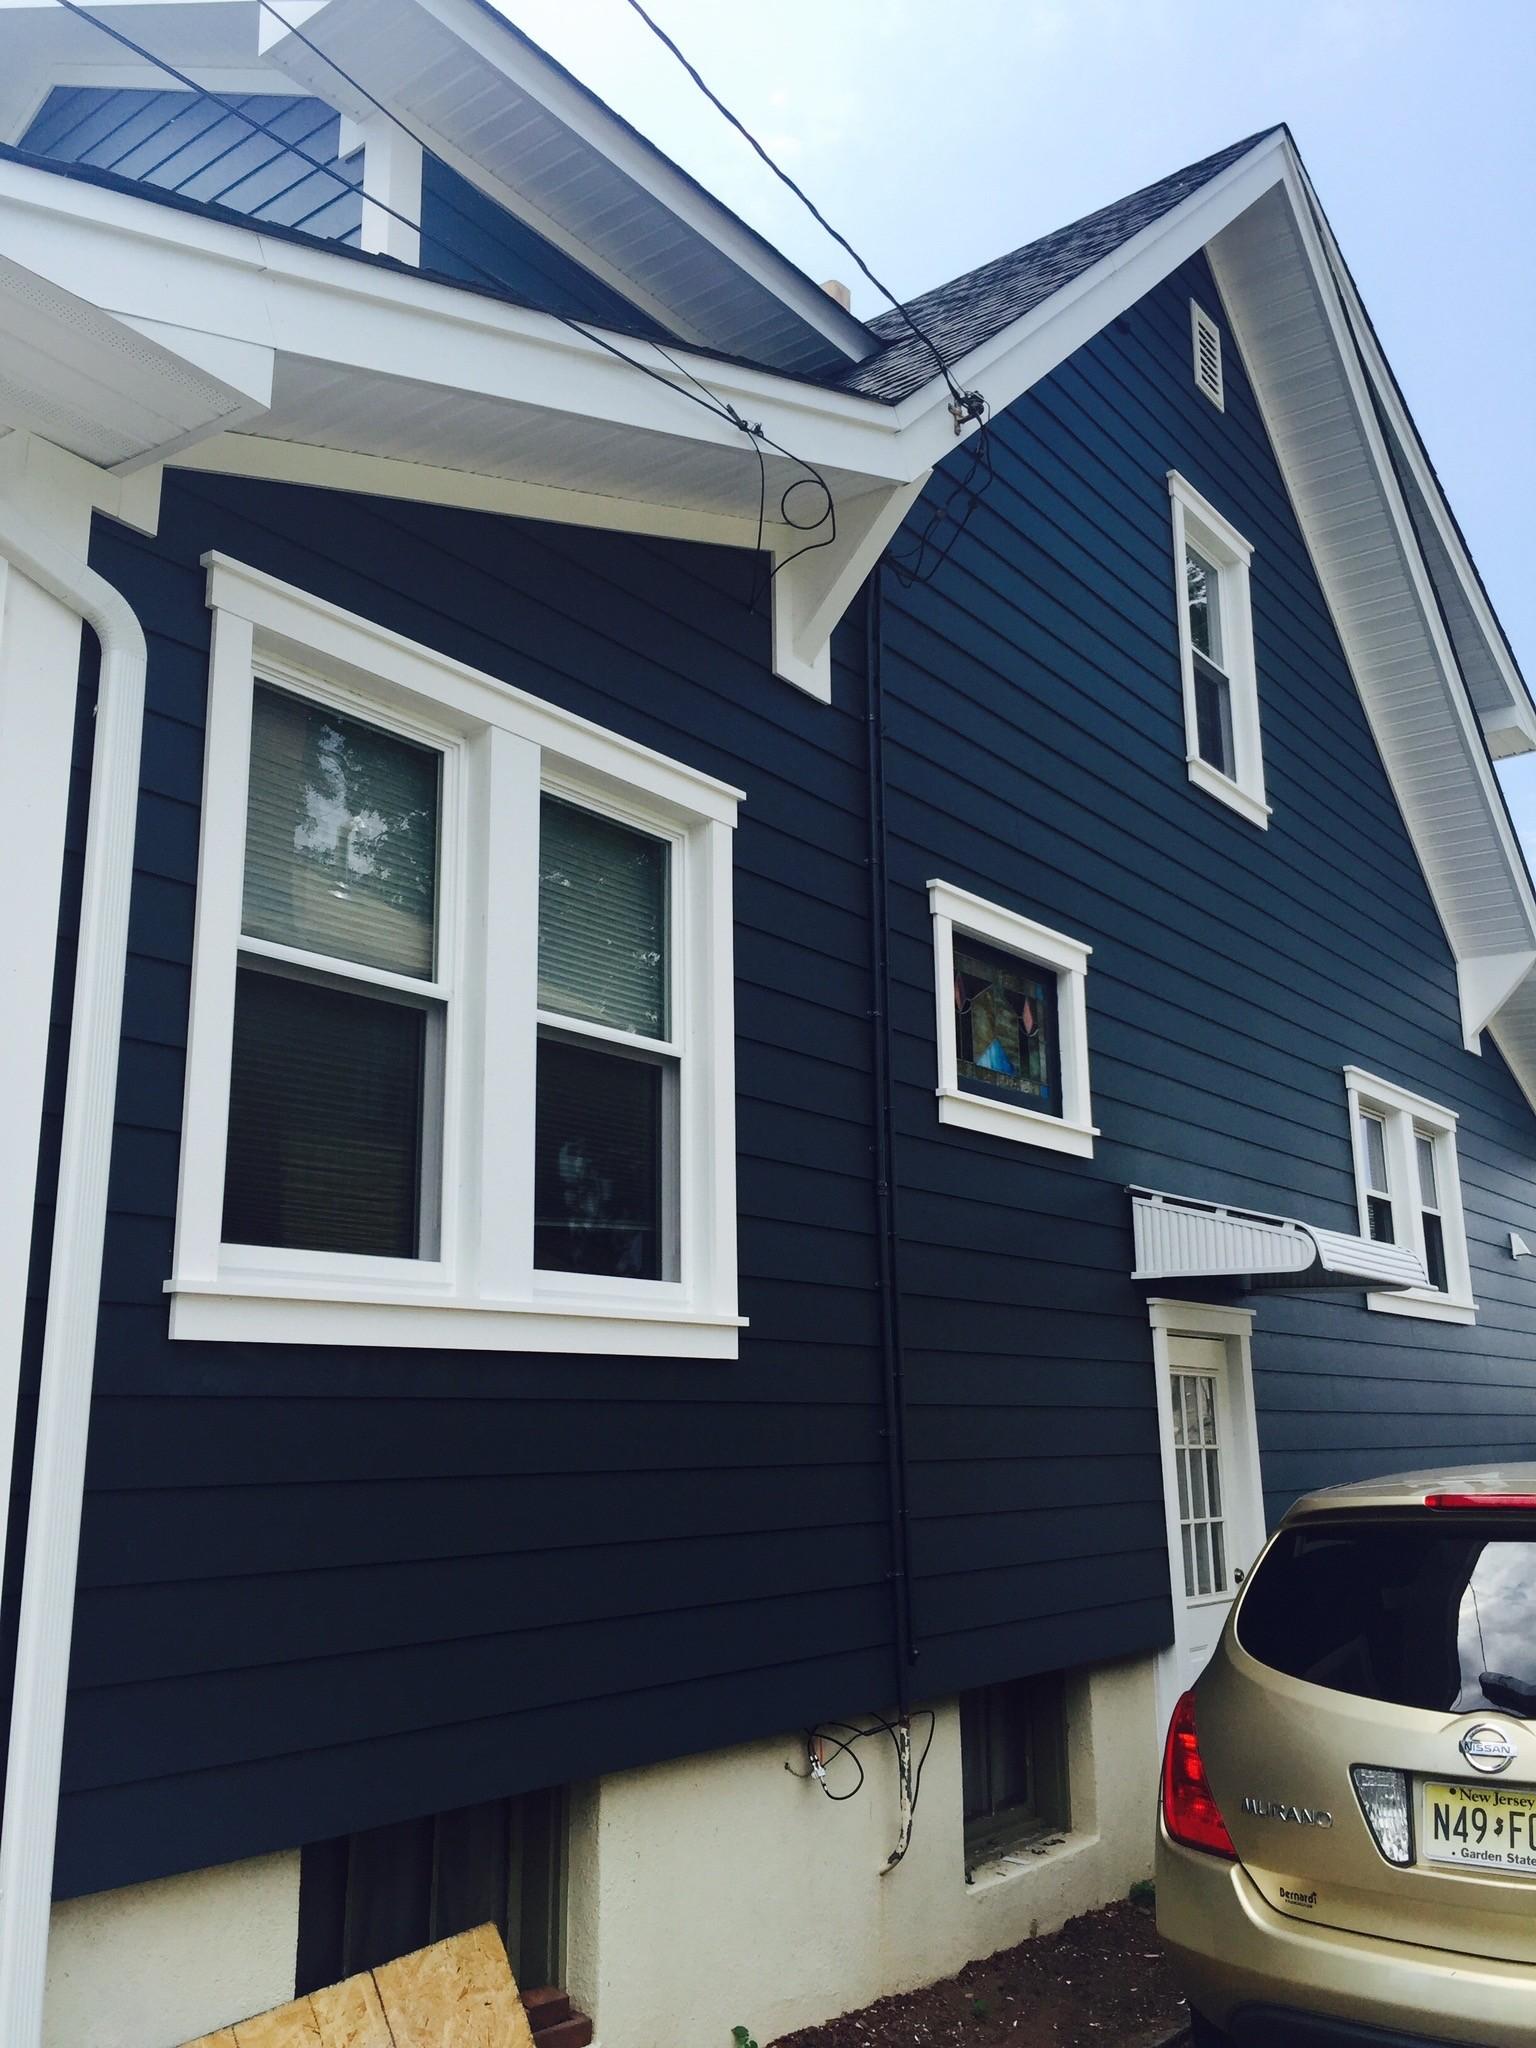 verona nj crane board vinyl siding 973 487 3704 nj siding contractors. Black Bedroom Furniture Sets. Home Design Ideas